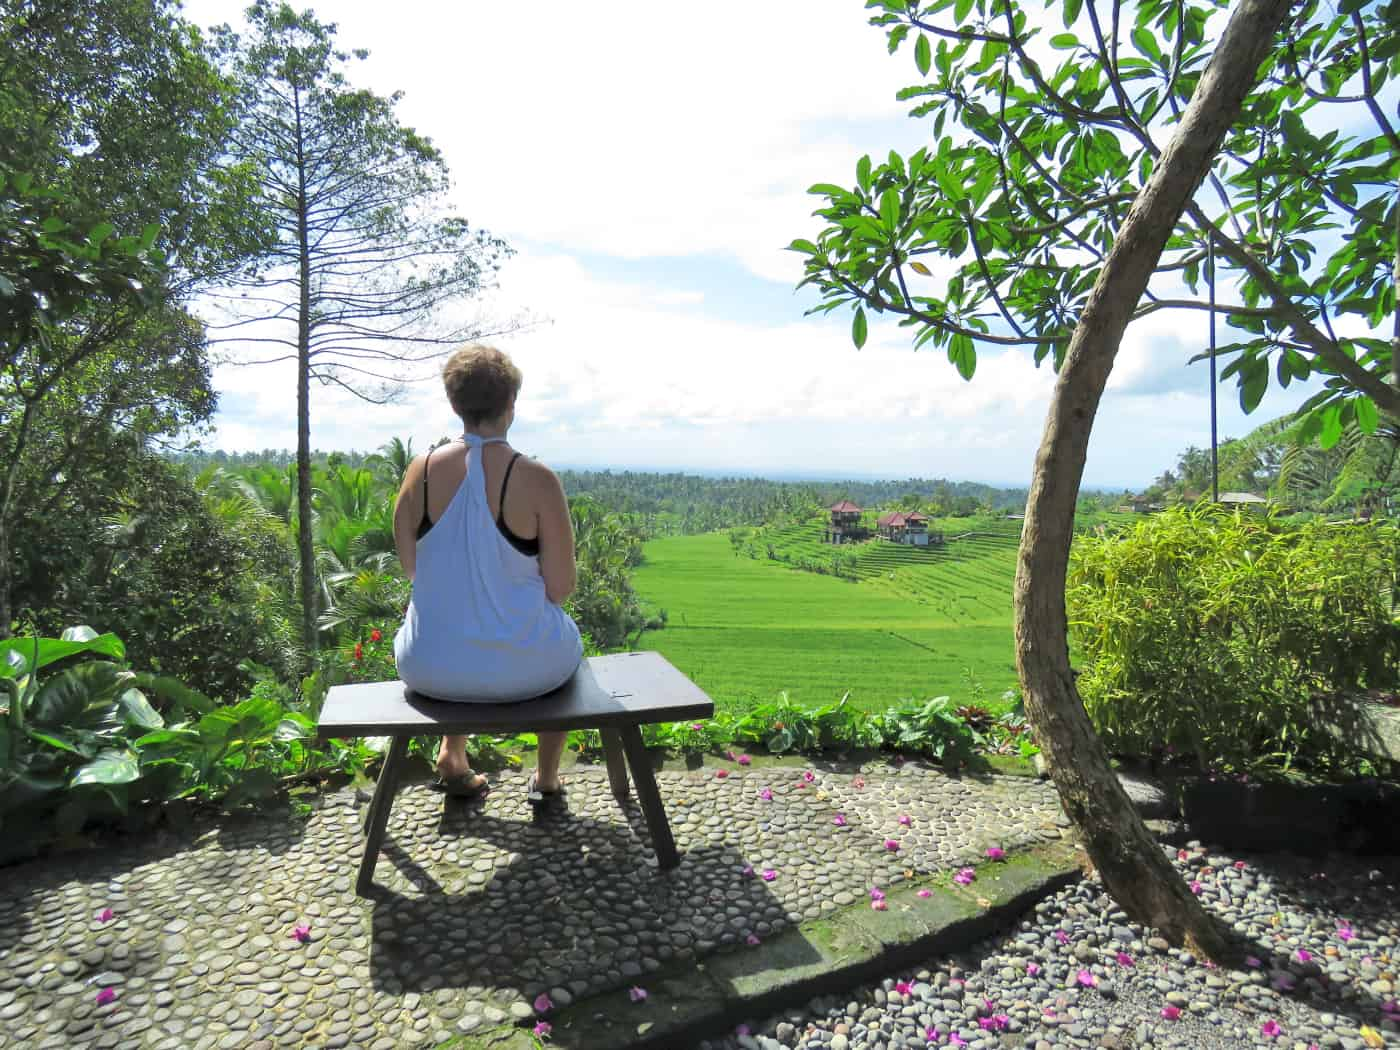 gogirlrun_bali_indonesien_privatetour_norden_reisterassen_tabanan_27